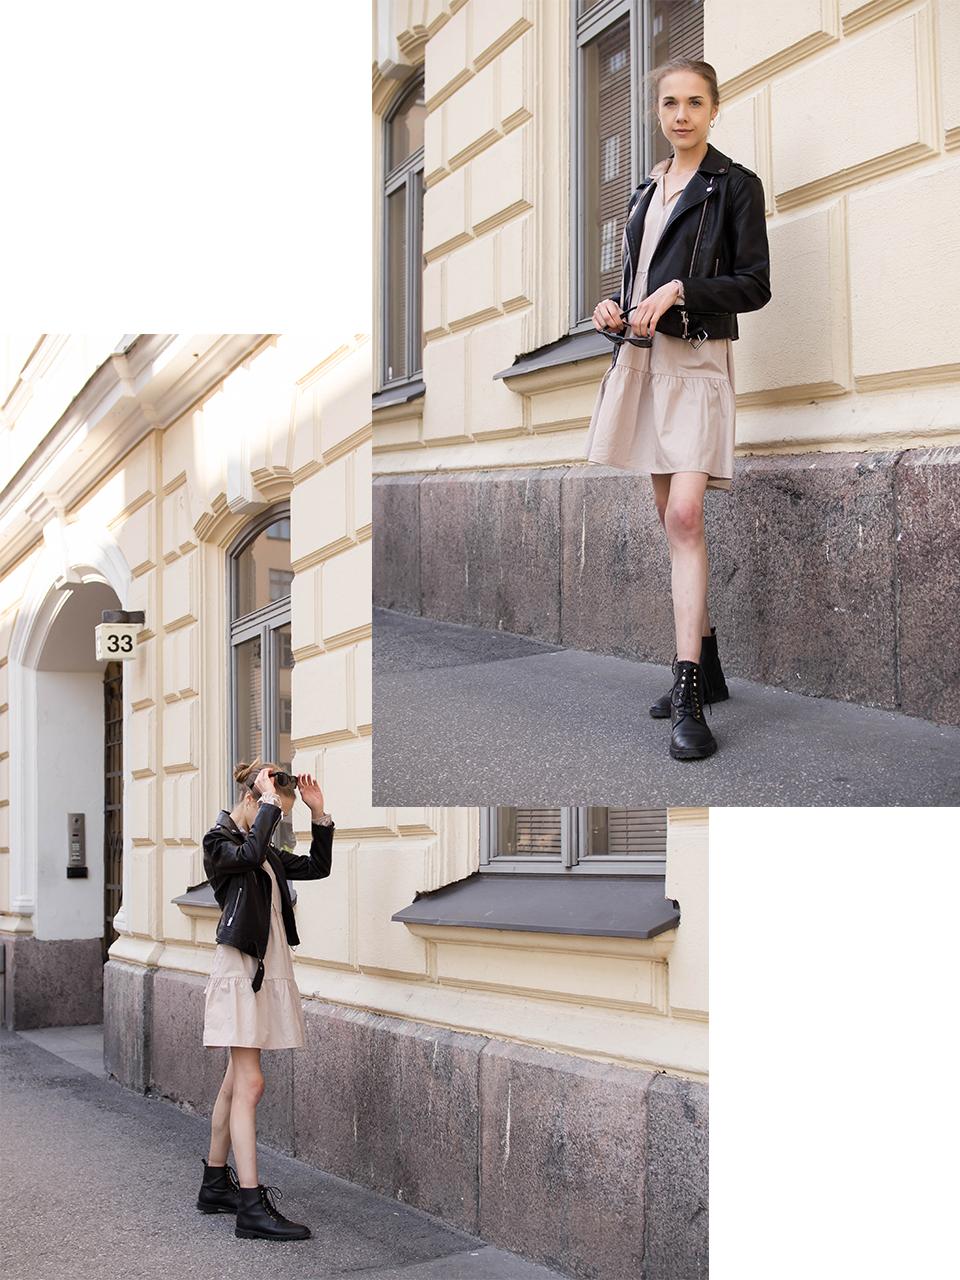 Saint Laurent inspired minimal outfit - Saint Laurent inspiroima minimalistinen asu